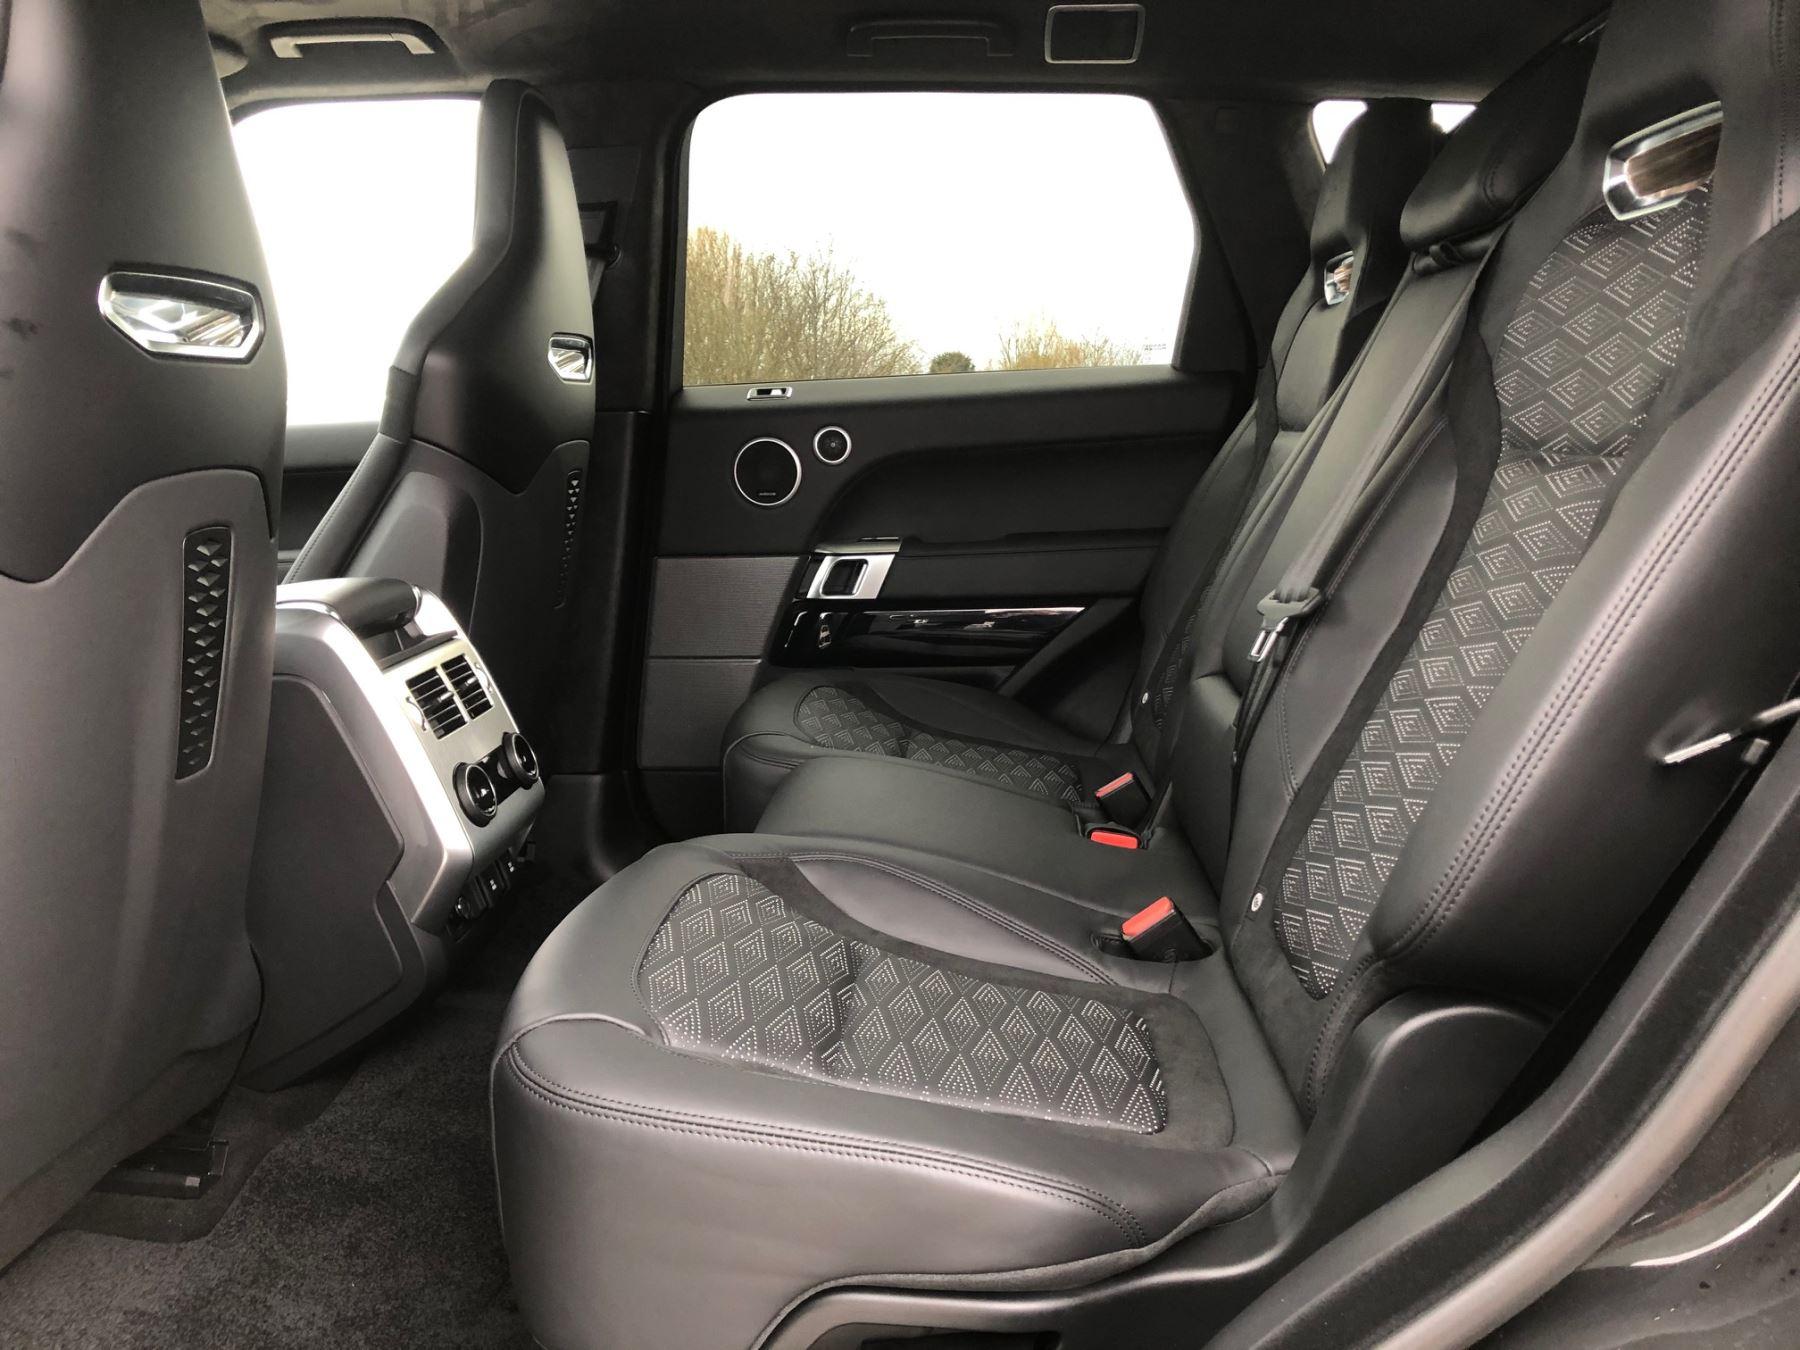 Land Rover Range Rover Sport 5.0 V8 S/C 575 SVR image 8